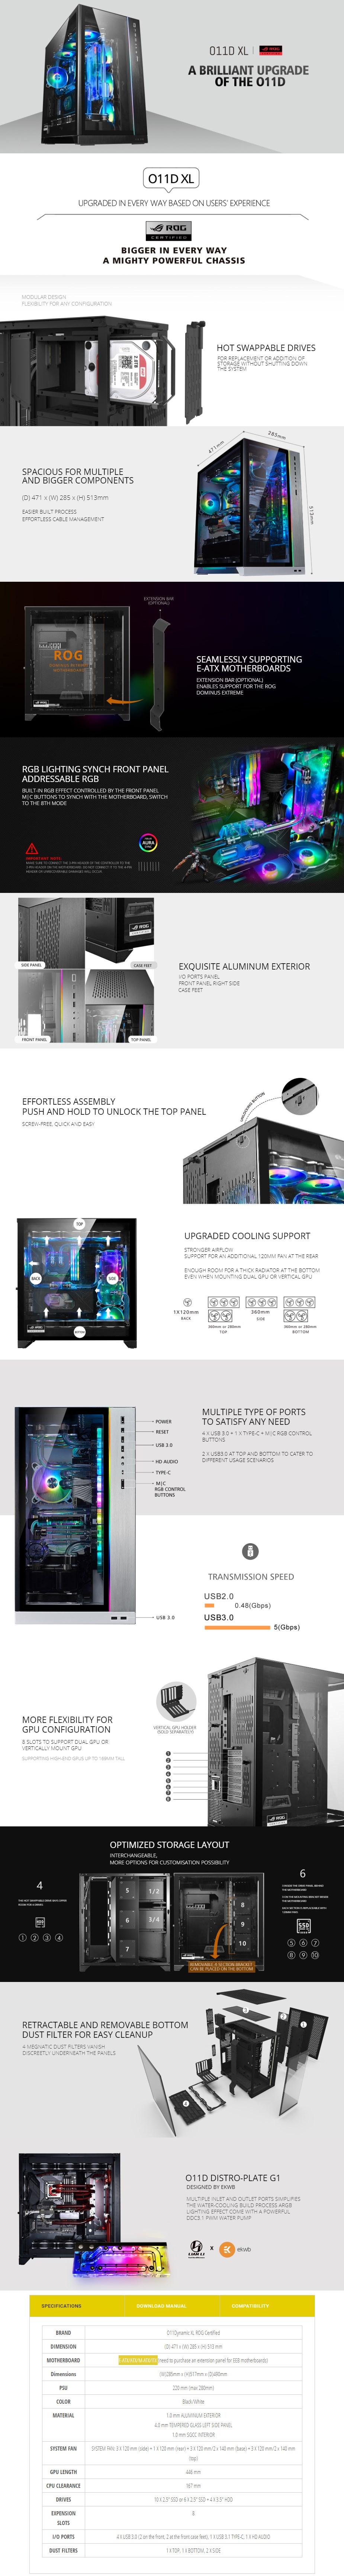 lianli-pc011-dynamic-xl-rgb-tempered-glass-eatx-rog-full-tower-case-black-ac27794.jpg